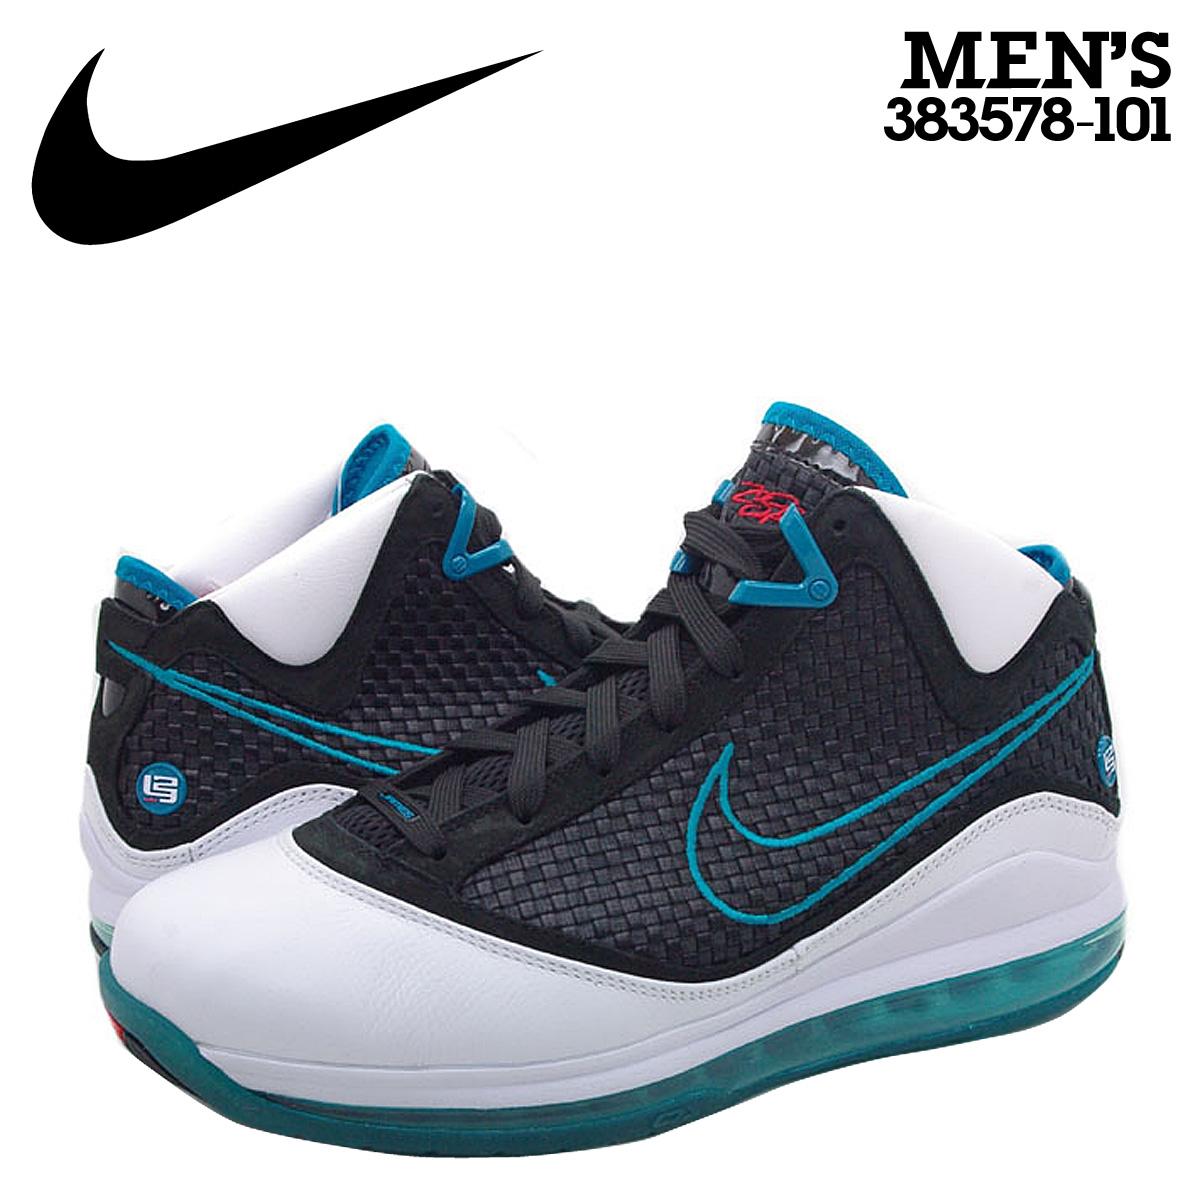 super popular ff6a7 34adc Nike NIKE Air Max sneakers NFW AIR MAX LEBRON7 Air Max LeBron 7 norflivayer  383578 - 101 white black mens